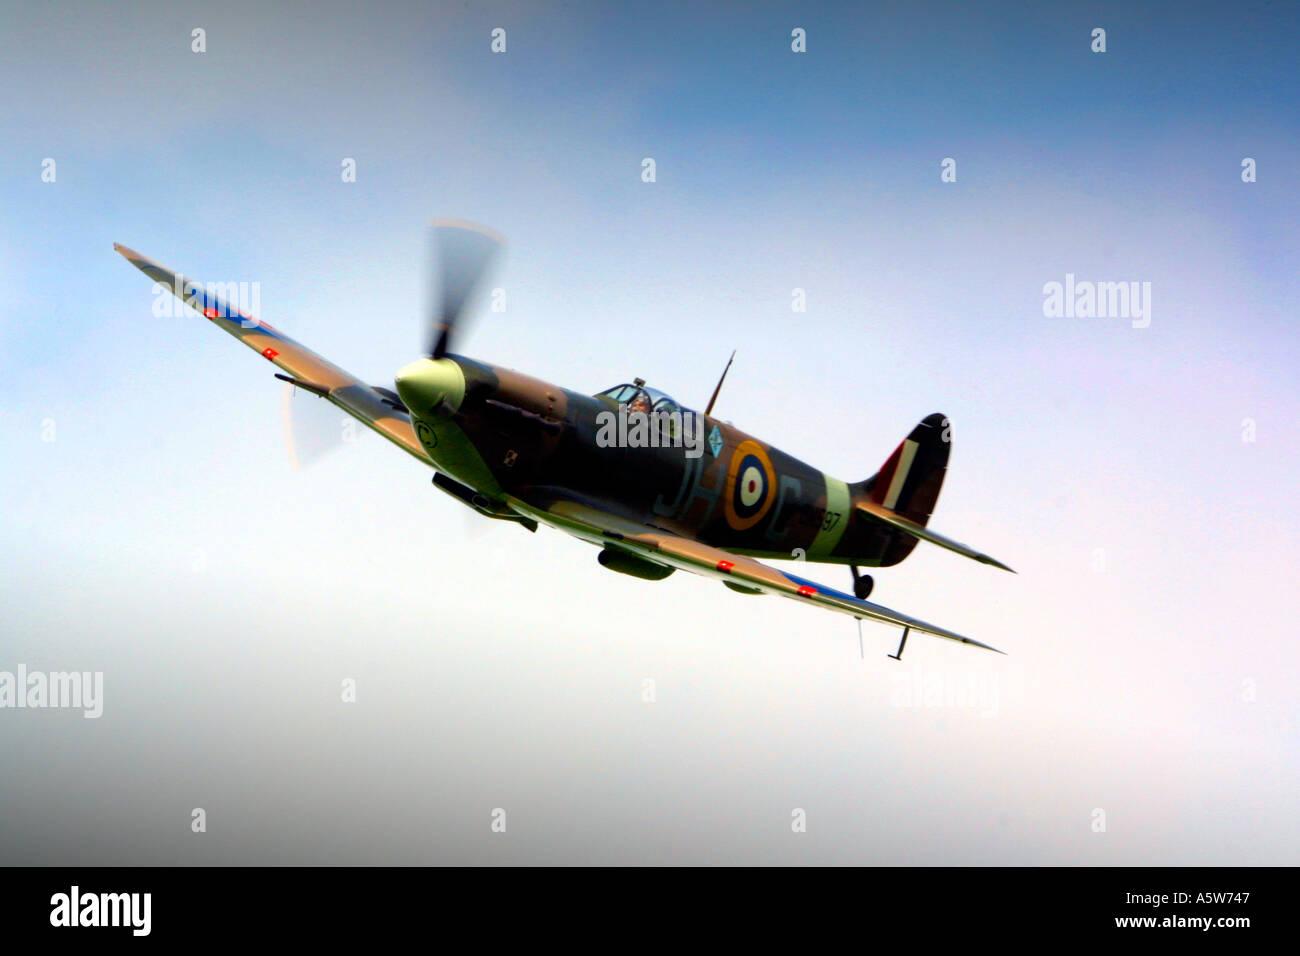 Royal Airforce Second World War Spitfire fighter plane Battle of Britain Flight - Stock Image